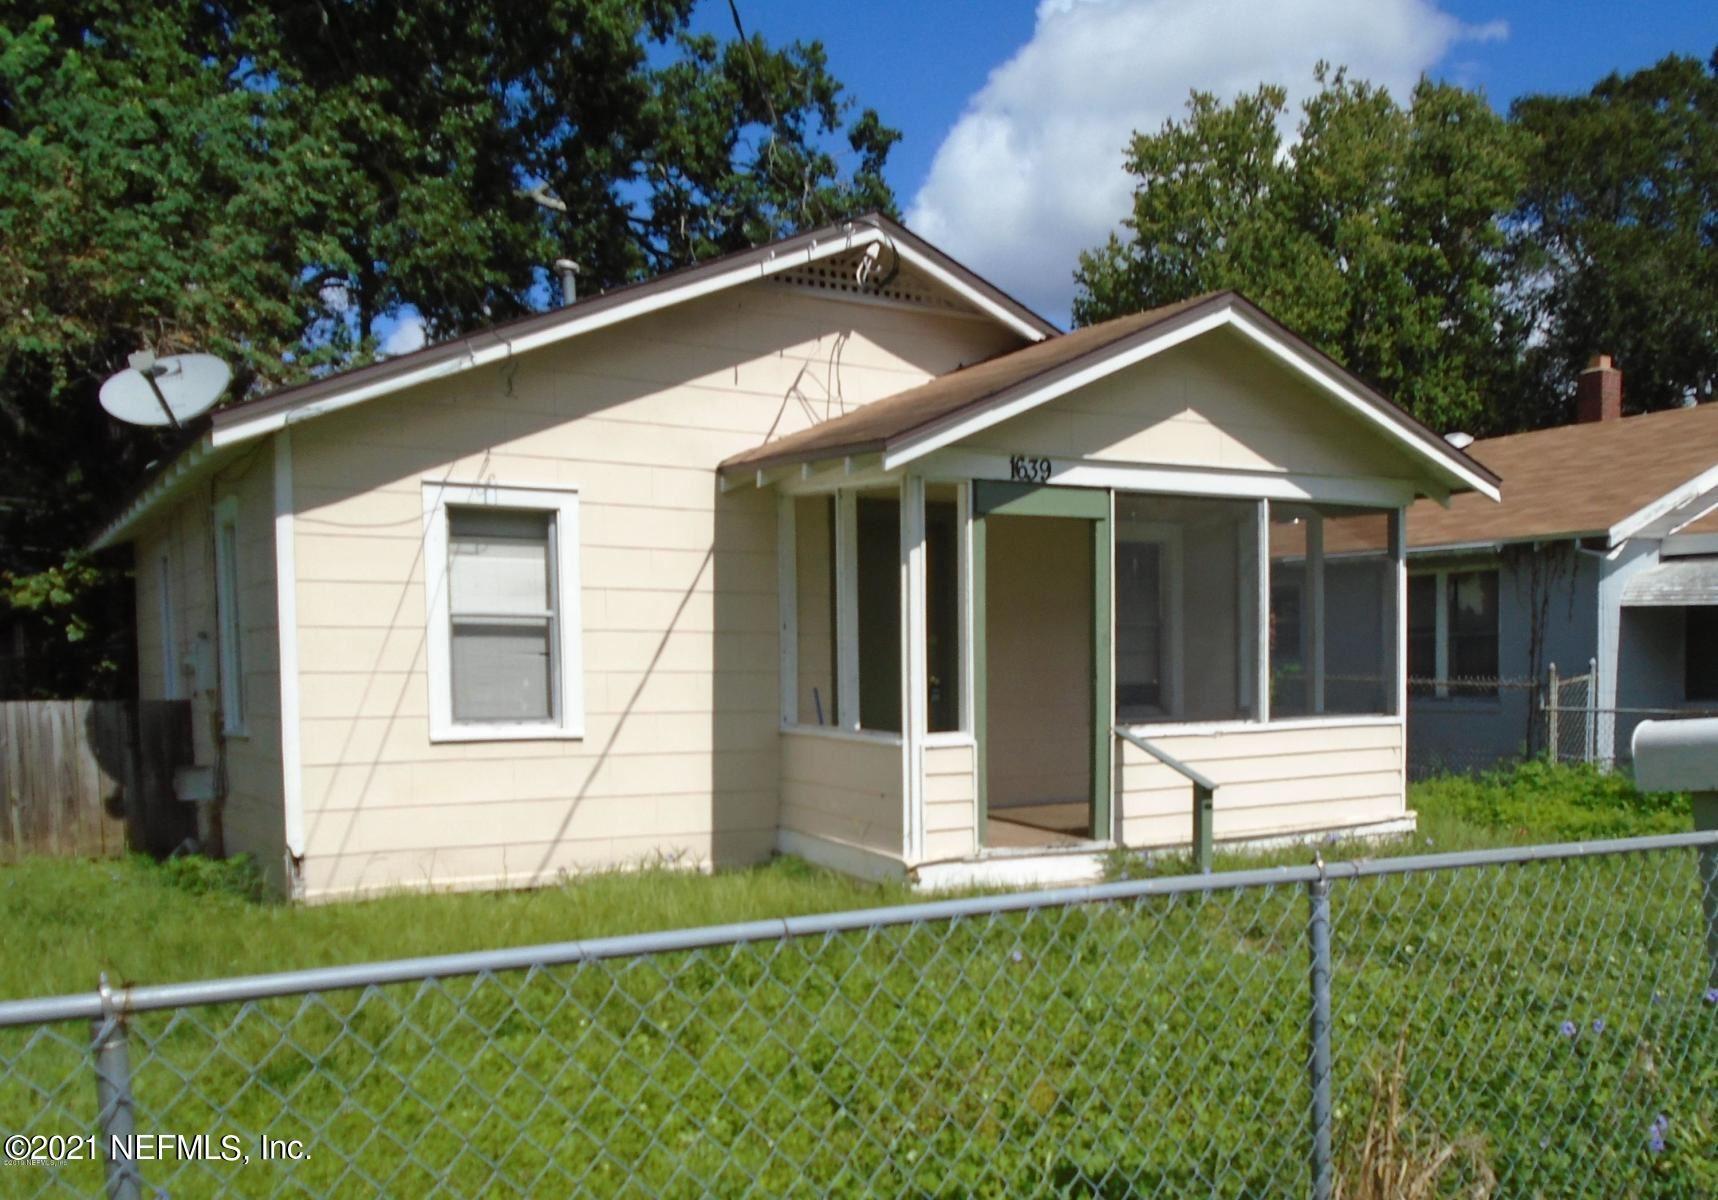 1639 W 16TH ST, Jacksonville, FL 32209 - MLS#: 1091497